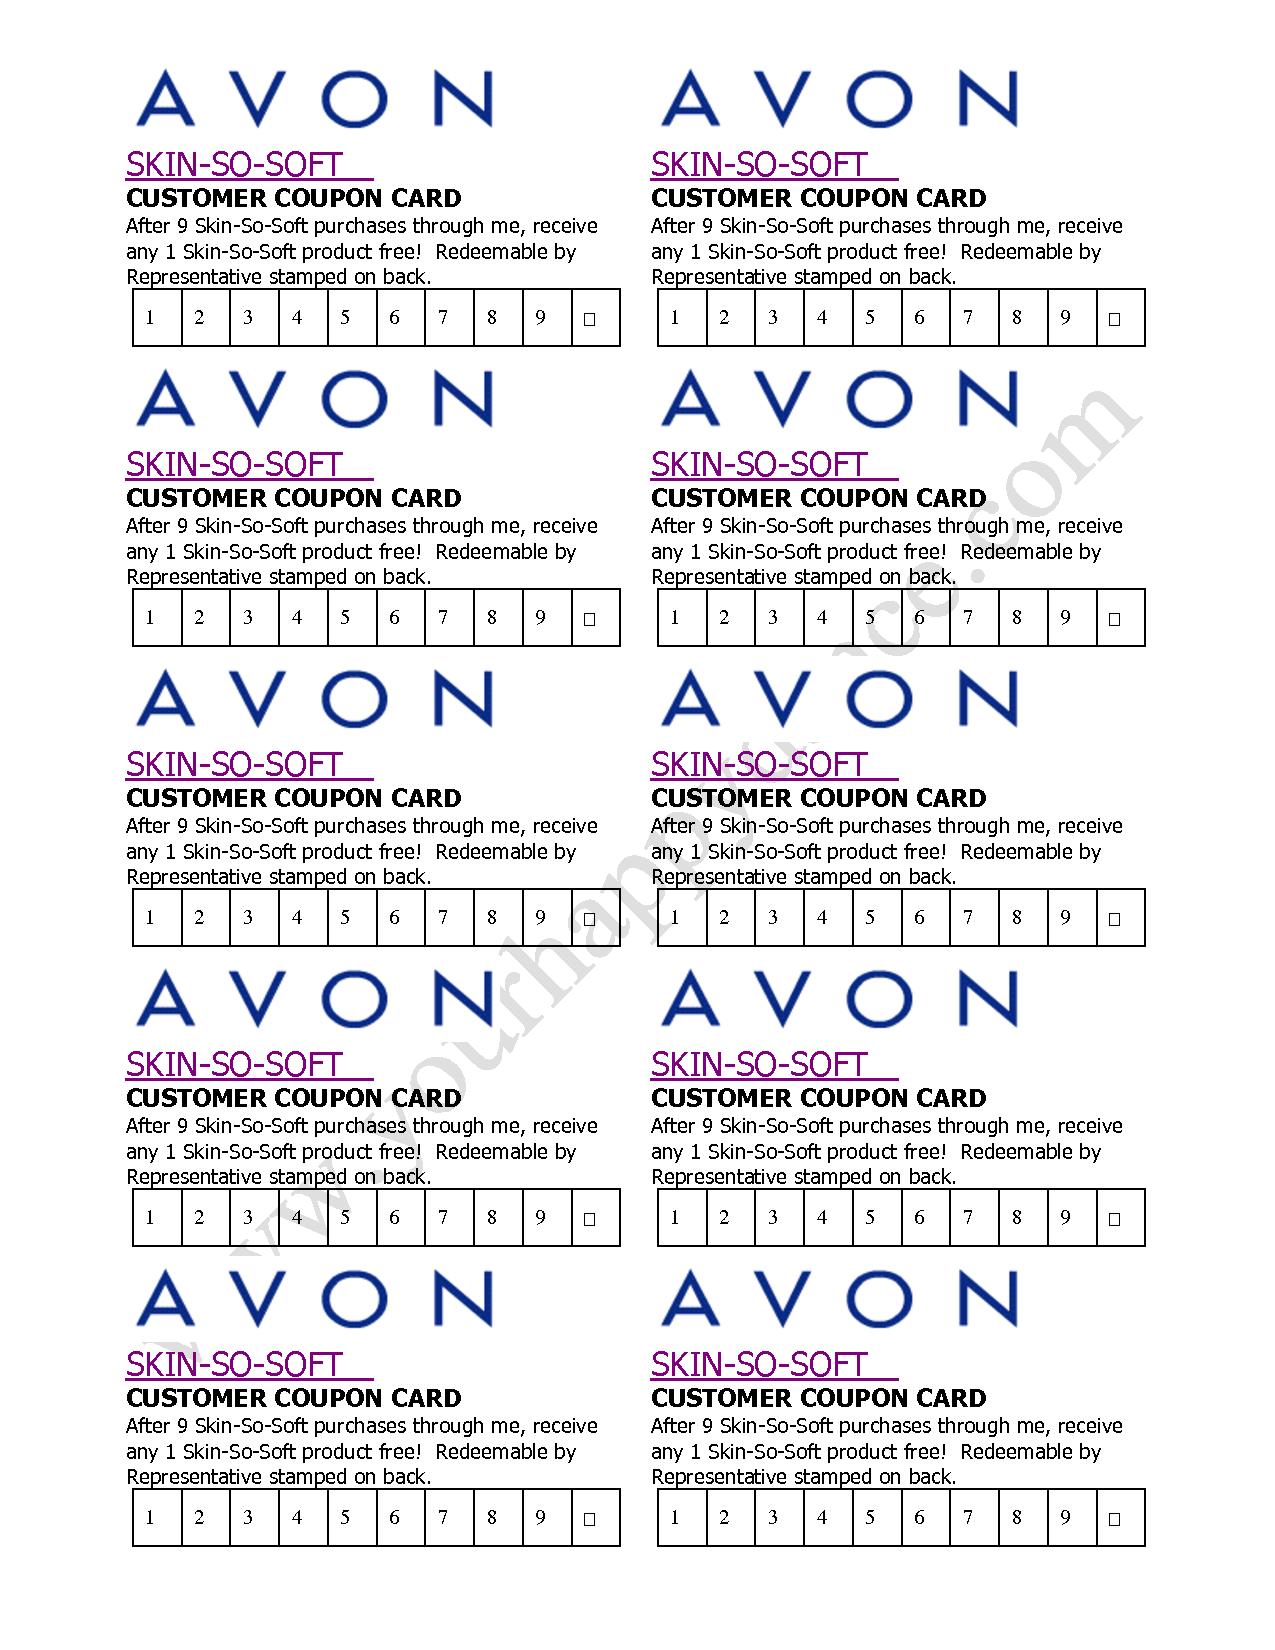 Pin By Michaela Daniels On Avon Sales Avon Skin So Soft Avon Avon Marketing